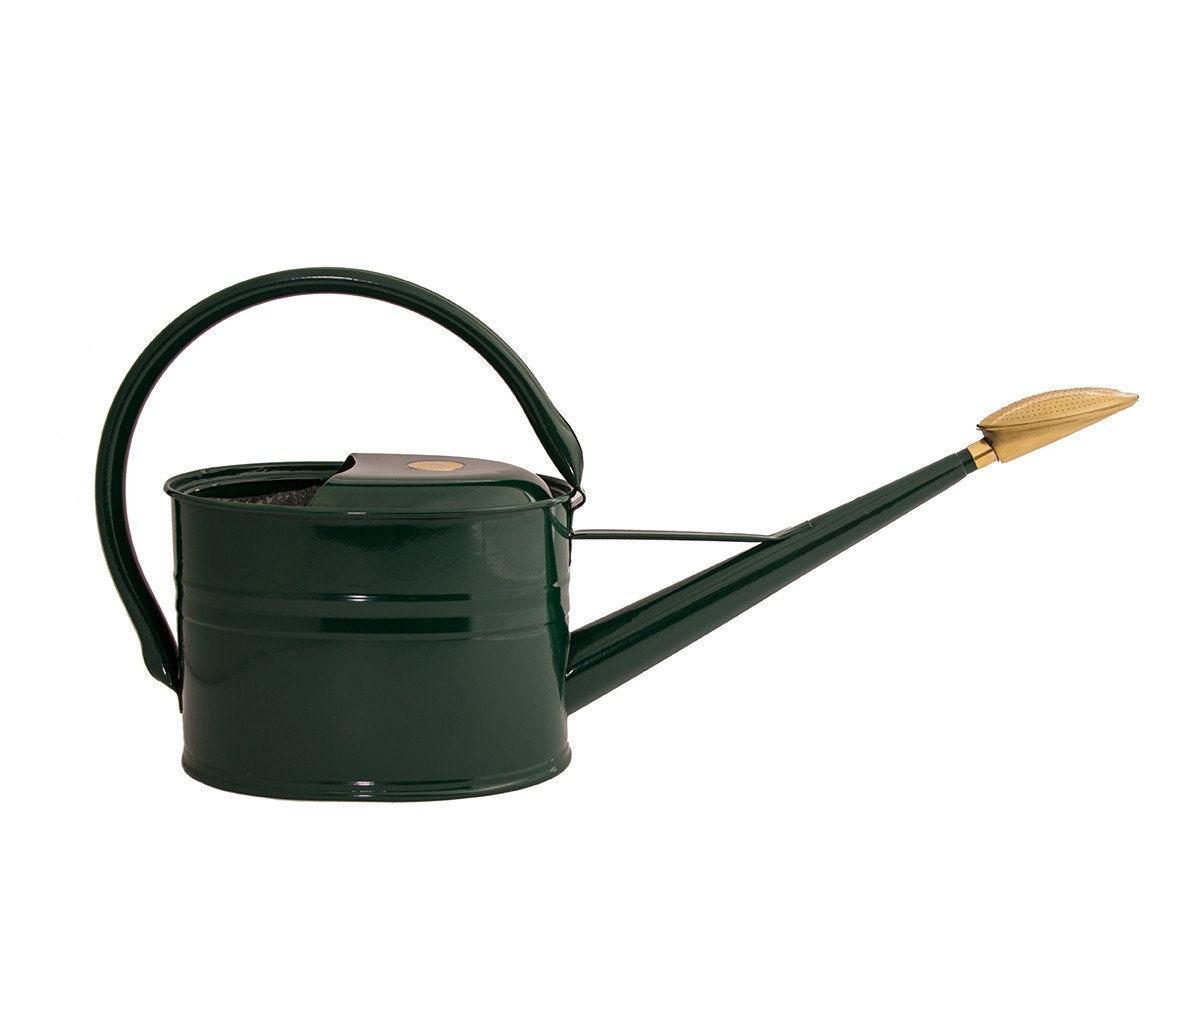 Arrosoir haws Slimcan Slimcan Slimcan - 5 L vert vert britannique 67a7ba